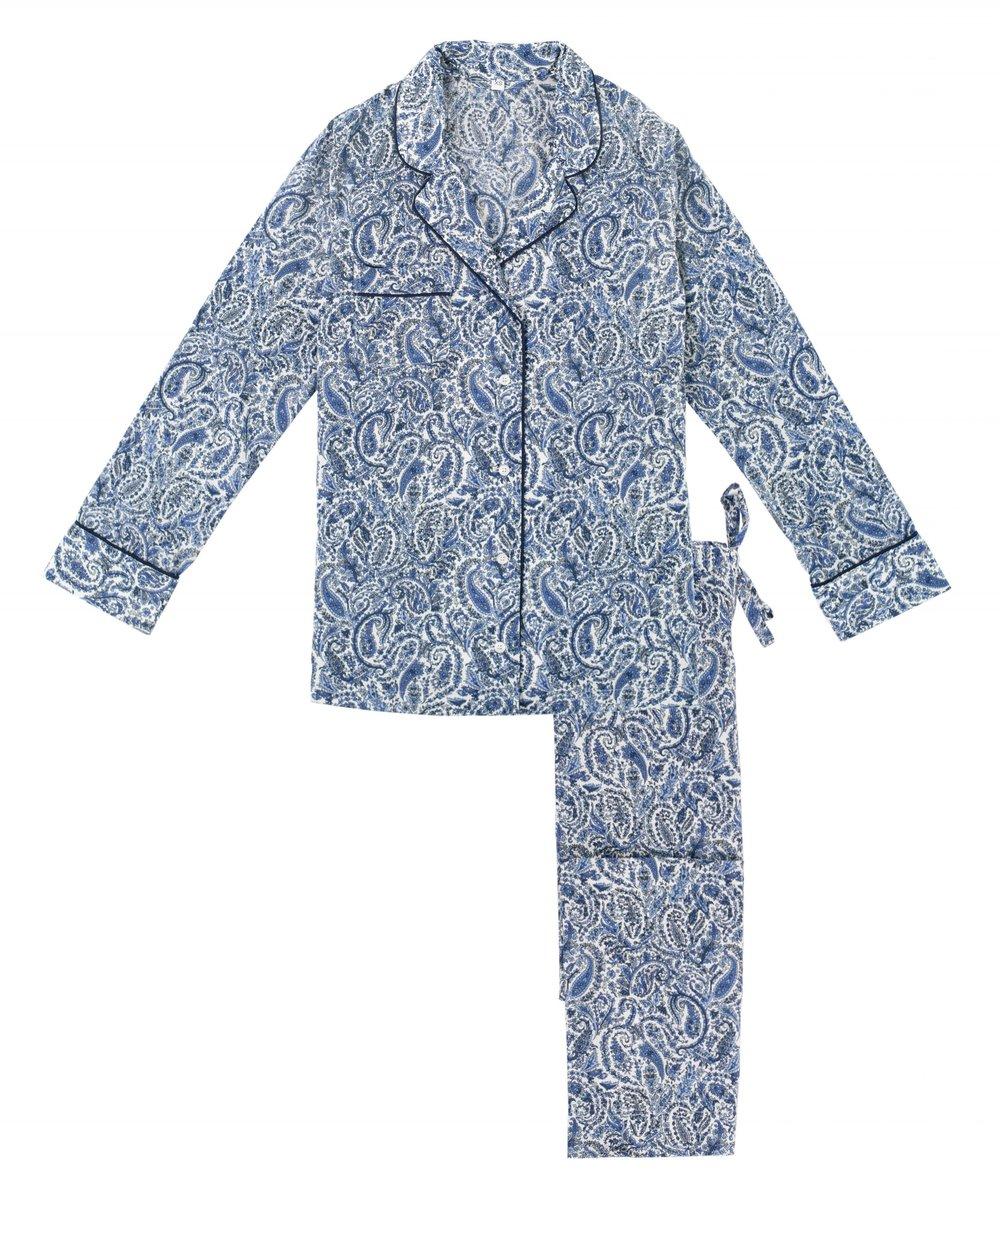 Women's Paisley Print Pyjama Set